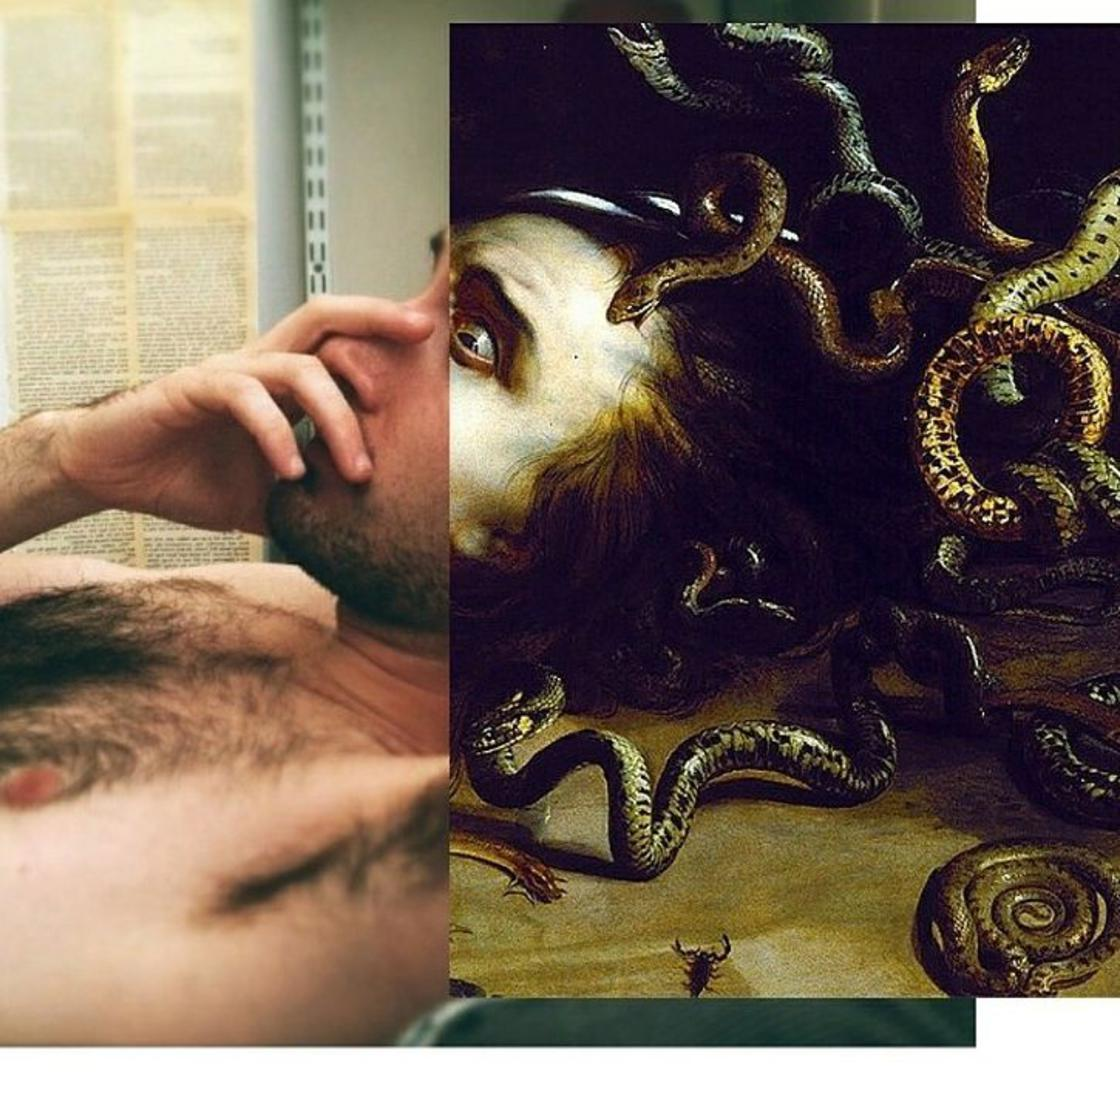 Les collages subversifs de NaroPinosa